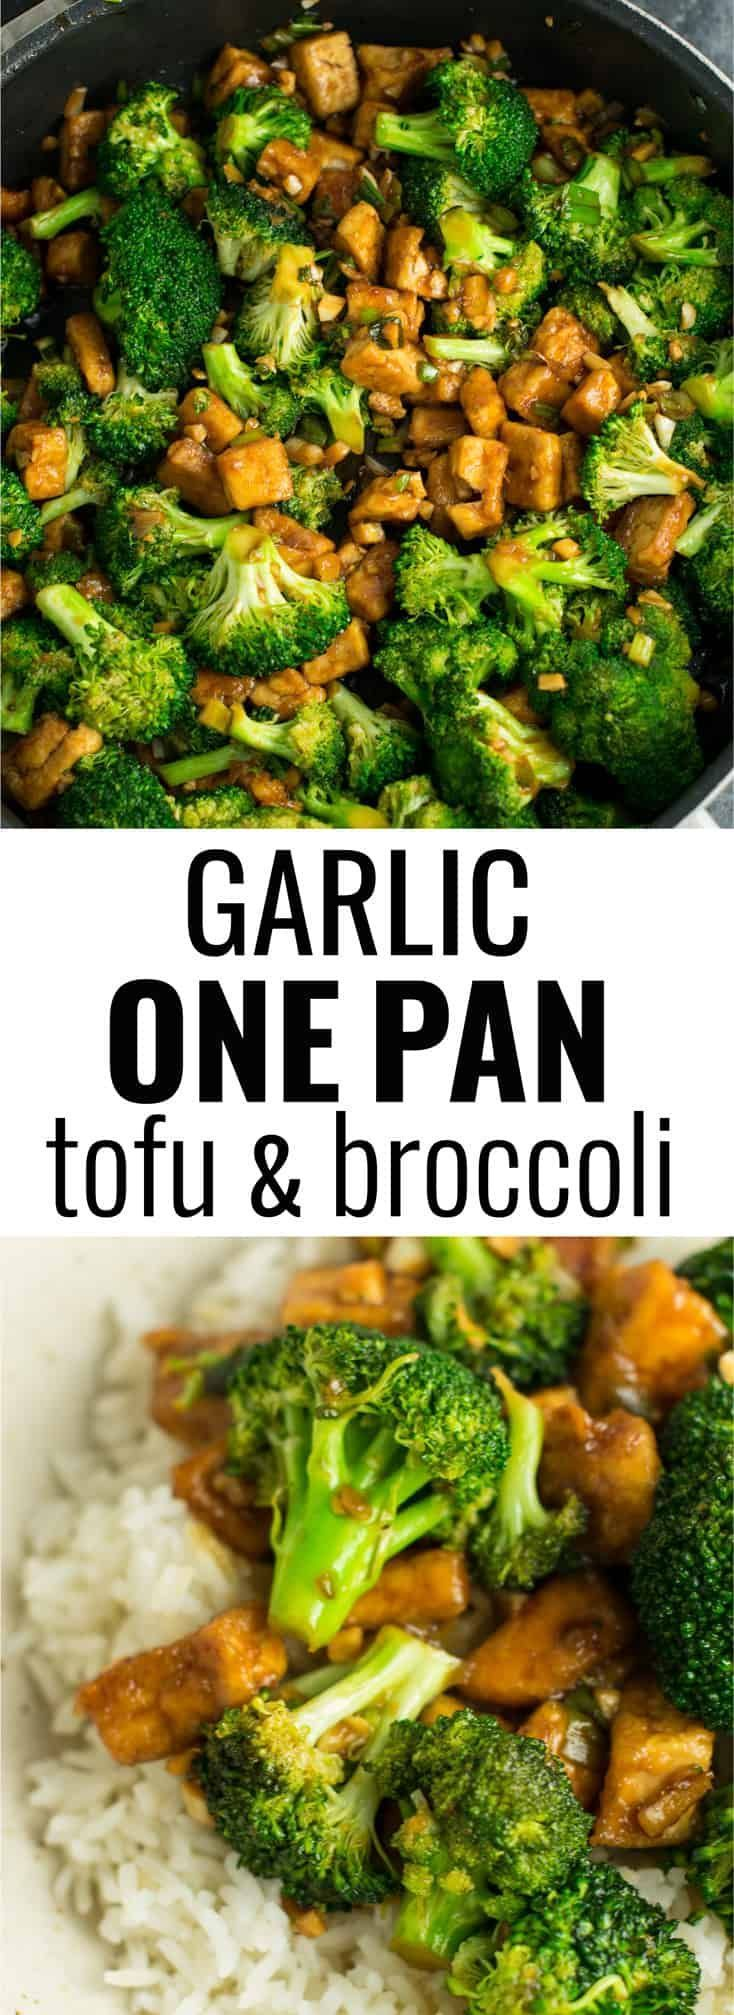 Garlic tofu broccoli skillet recipe made in just o…